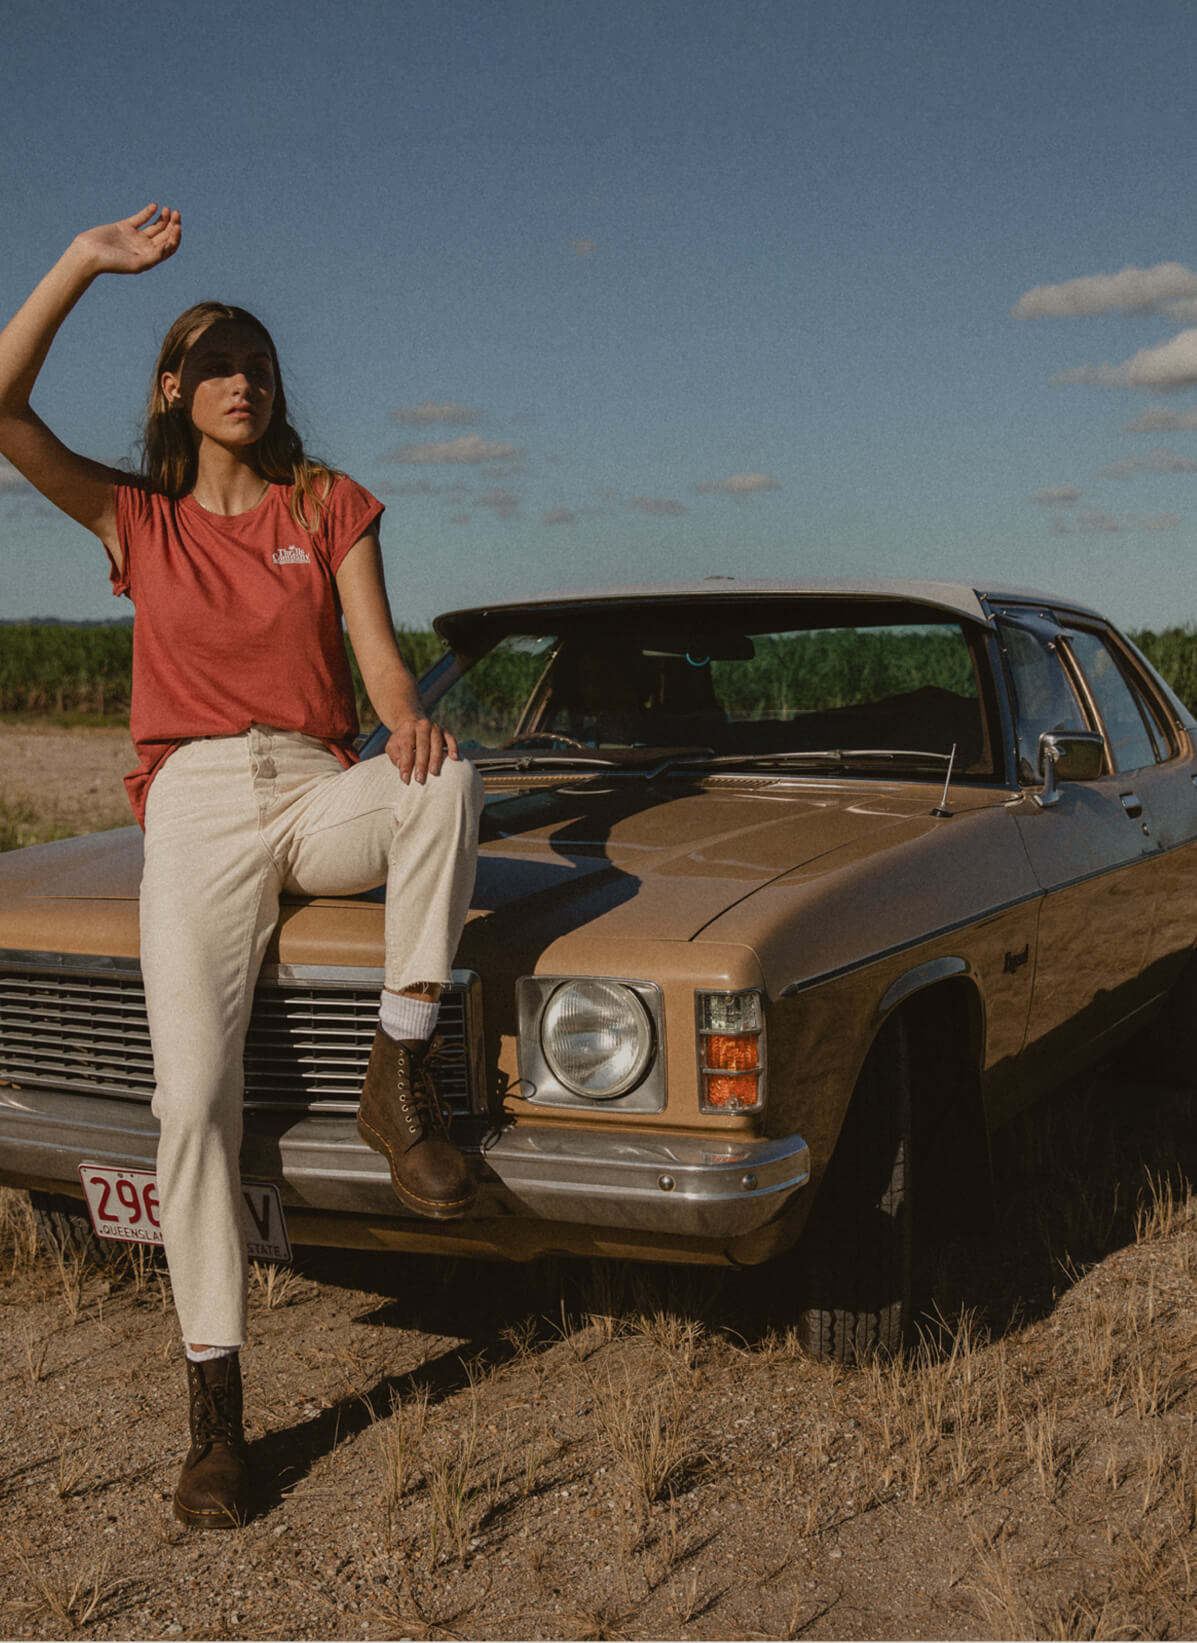 Girl leaning on car in white denim straight jeans